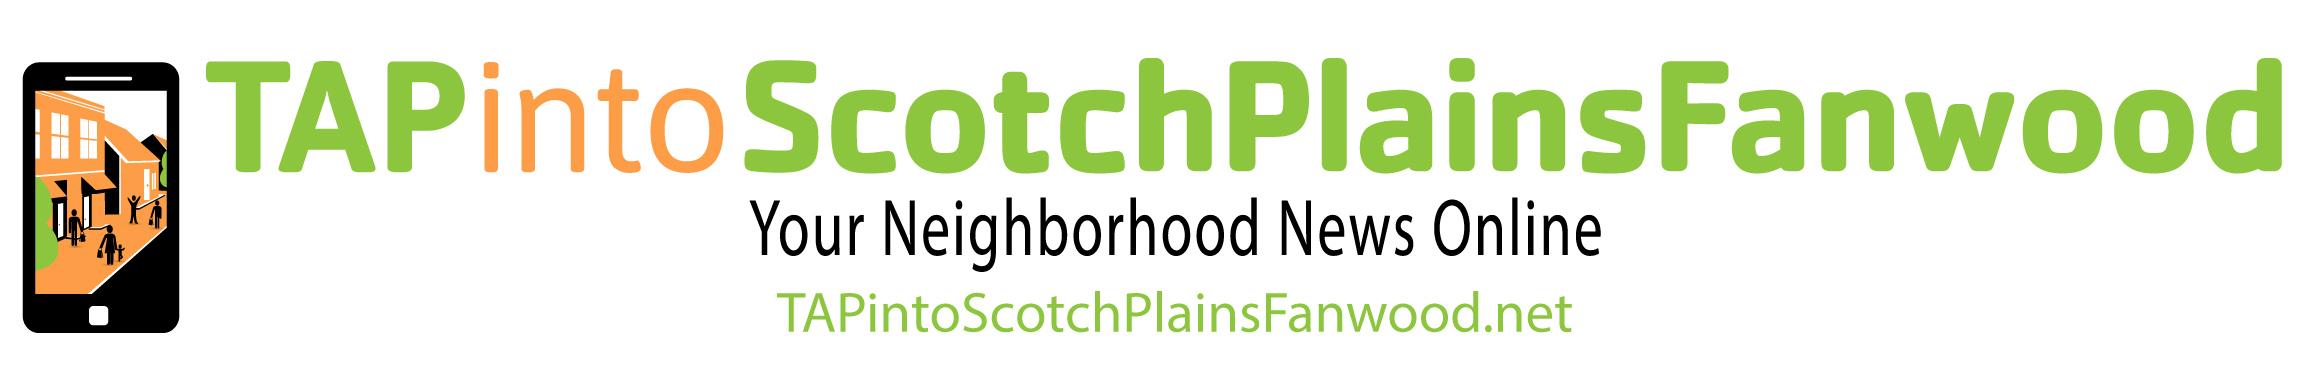 c320fc03477e4e584d7d_TAPintoScotchPlainsFanwood_logo.jpg